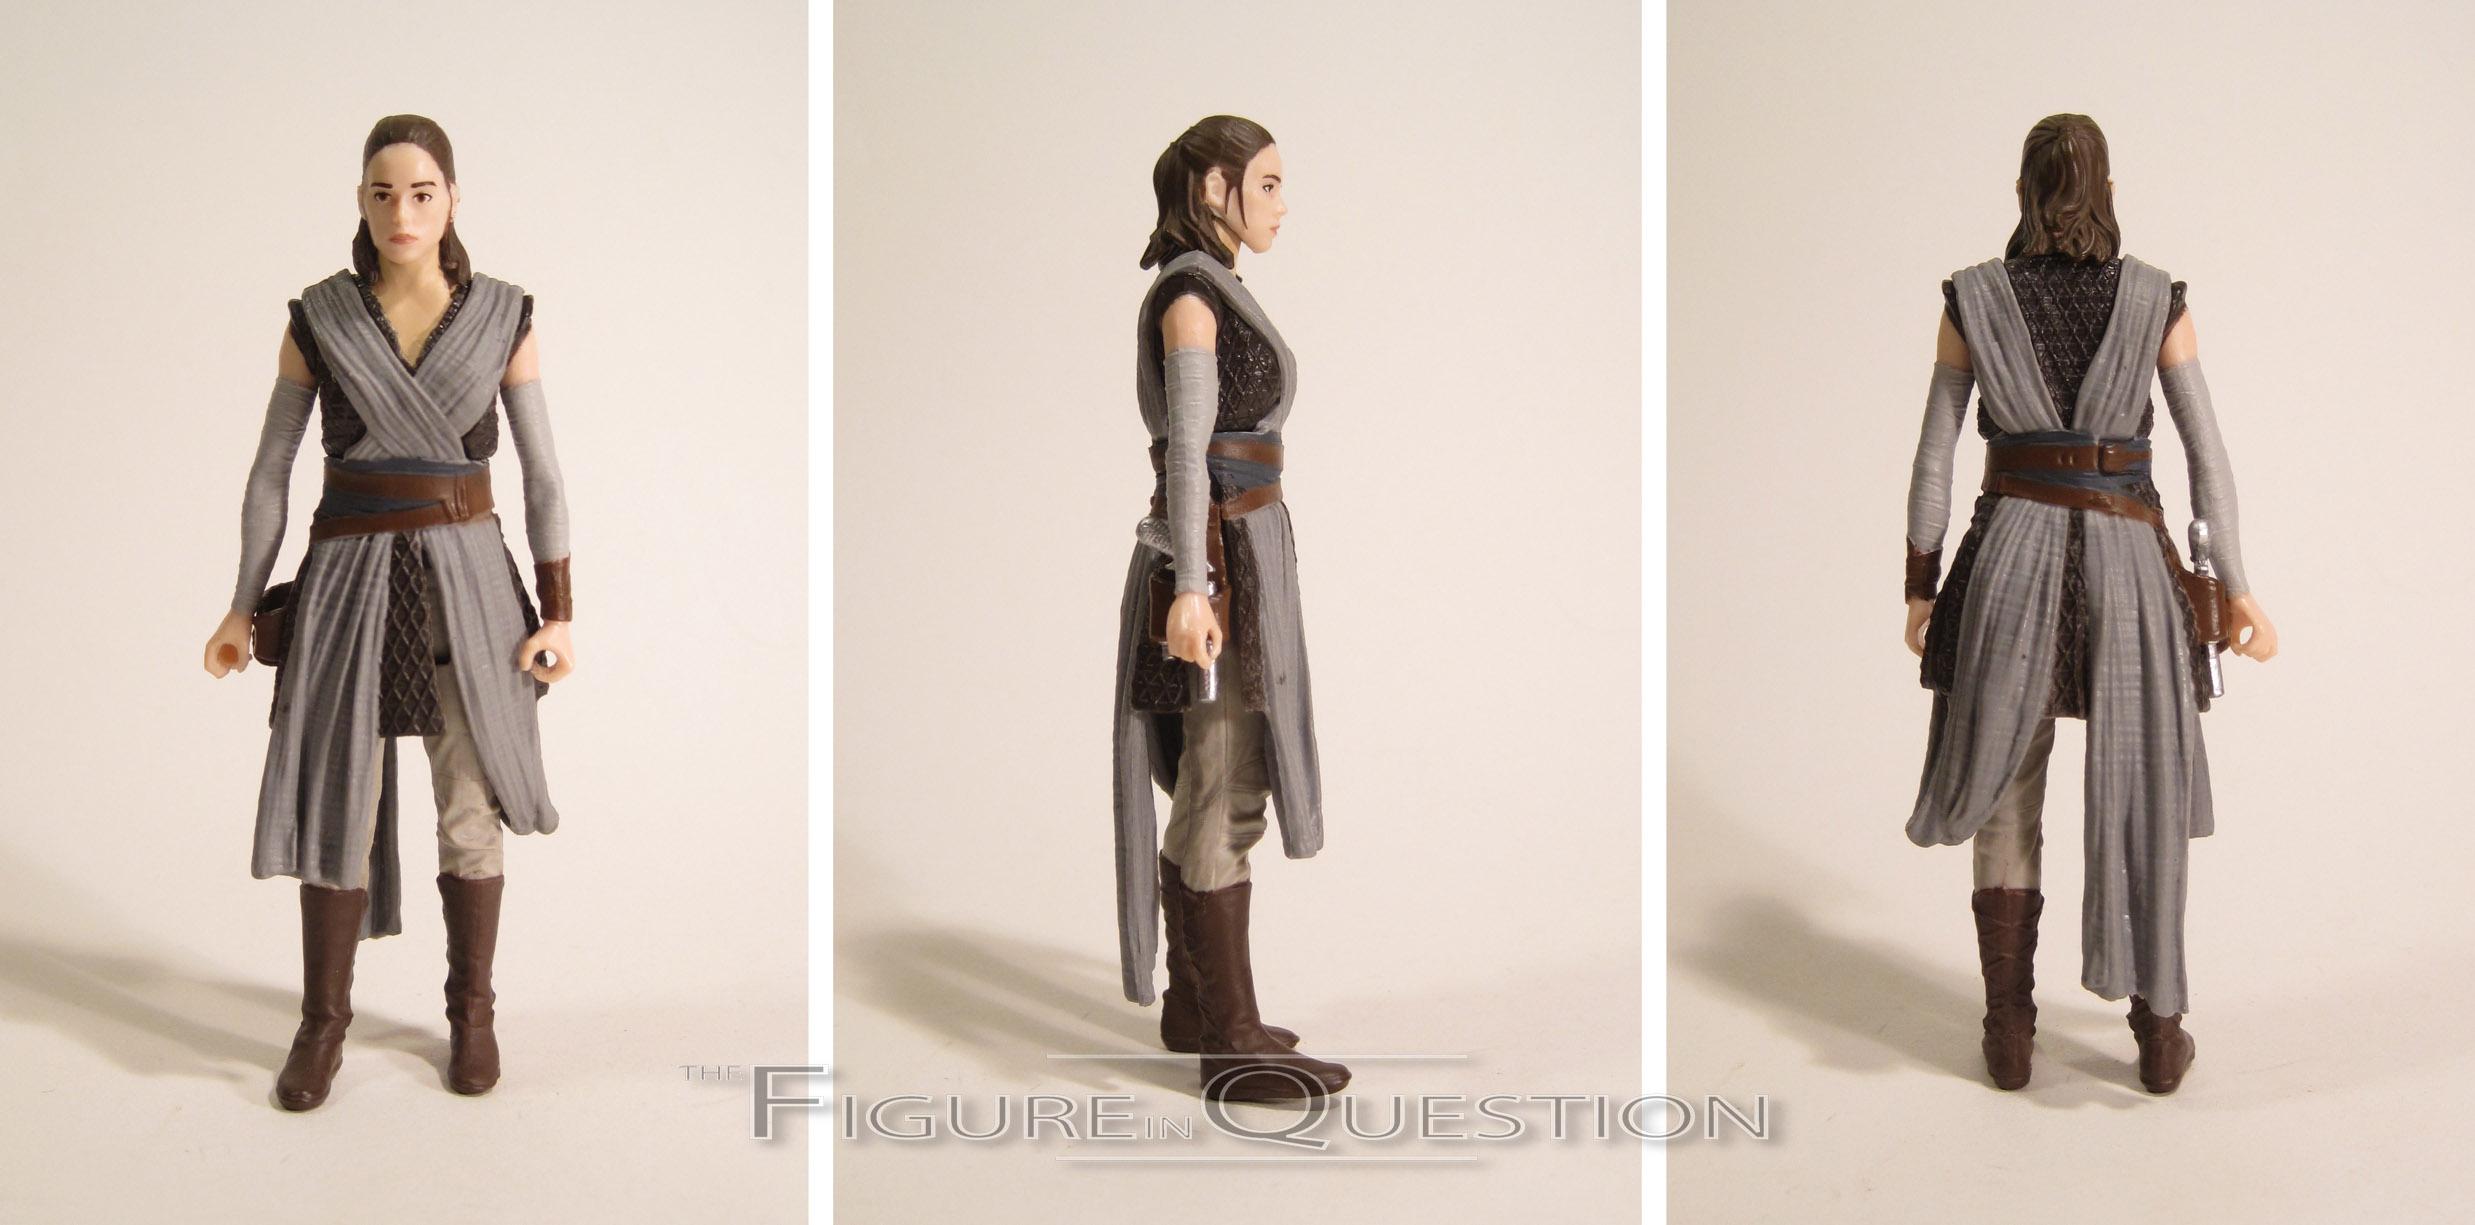 The Last Jedi Figure In Question Page 4 Bott Funko Pop Sw Tlj Porg Elite Praetorian Guard